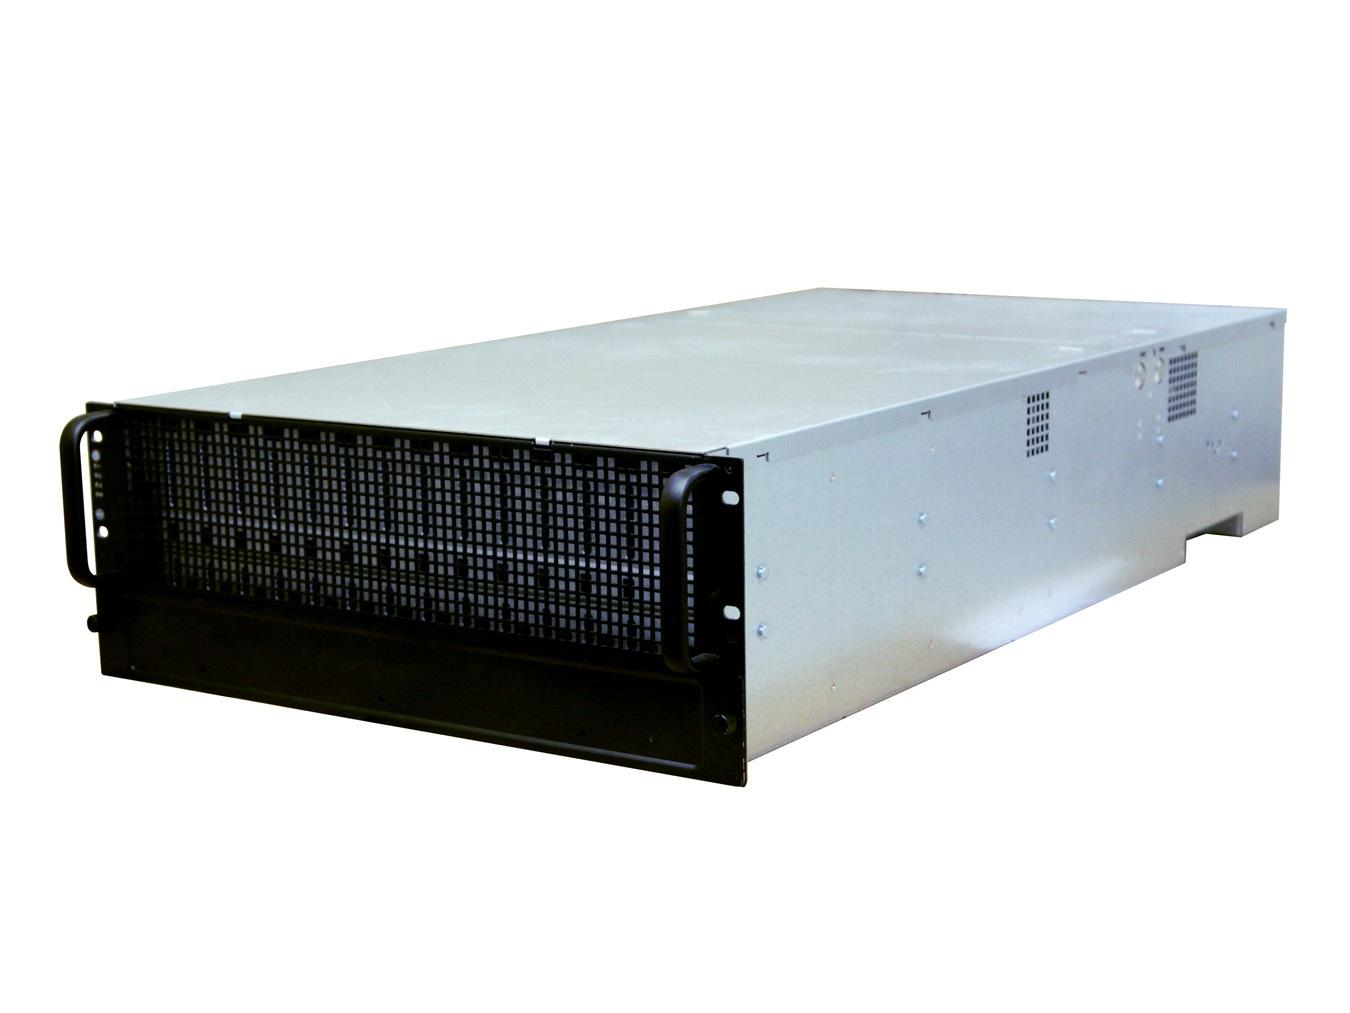 AIC J4060-01 XJ1-40601-03 4U 60-Bay 12Gb/s SAS JBOD